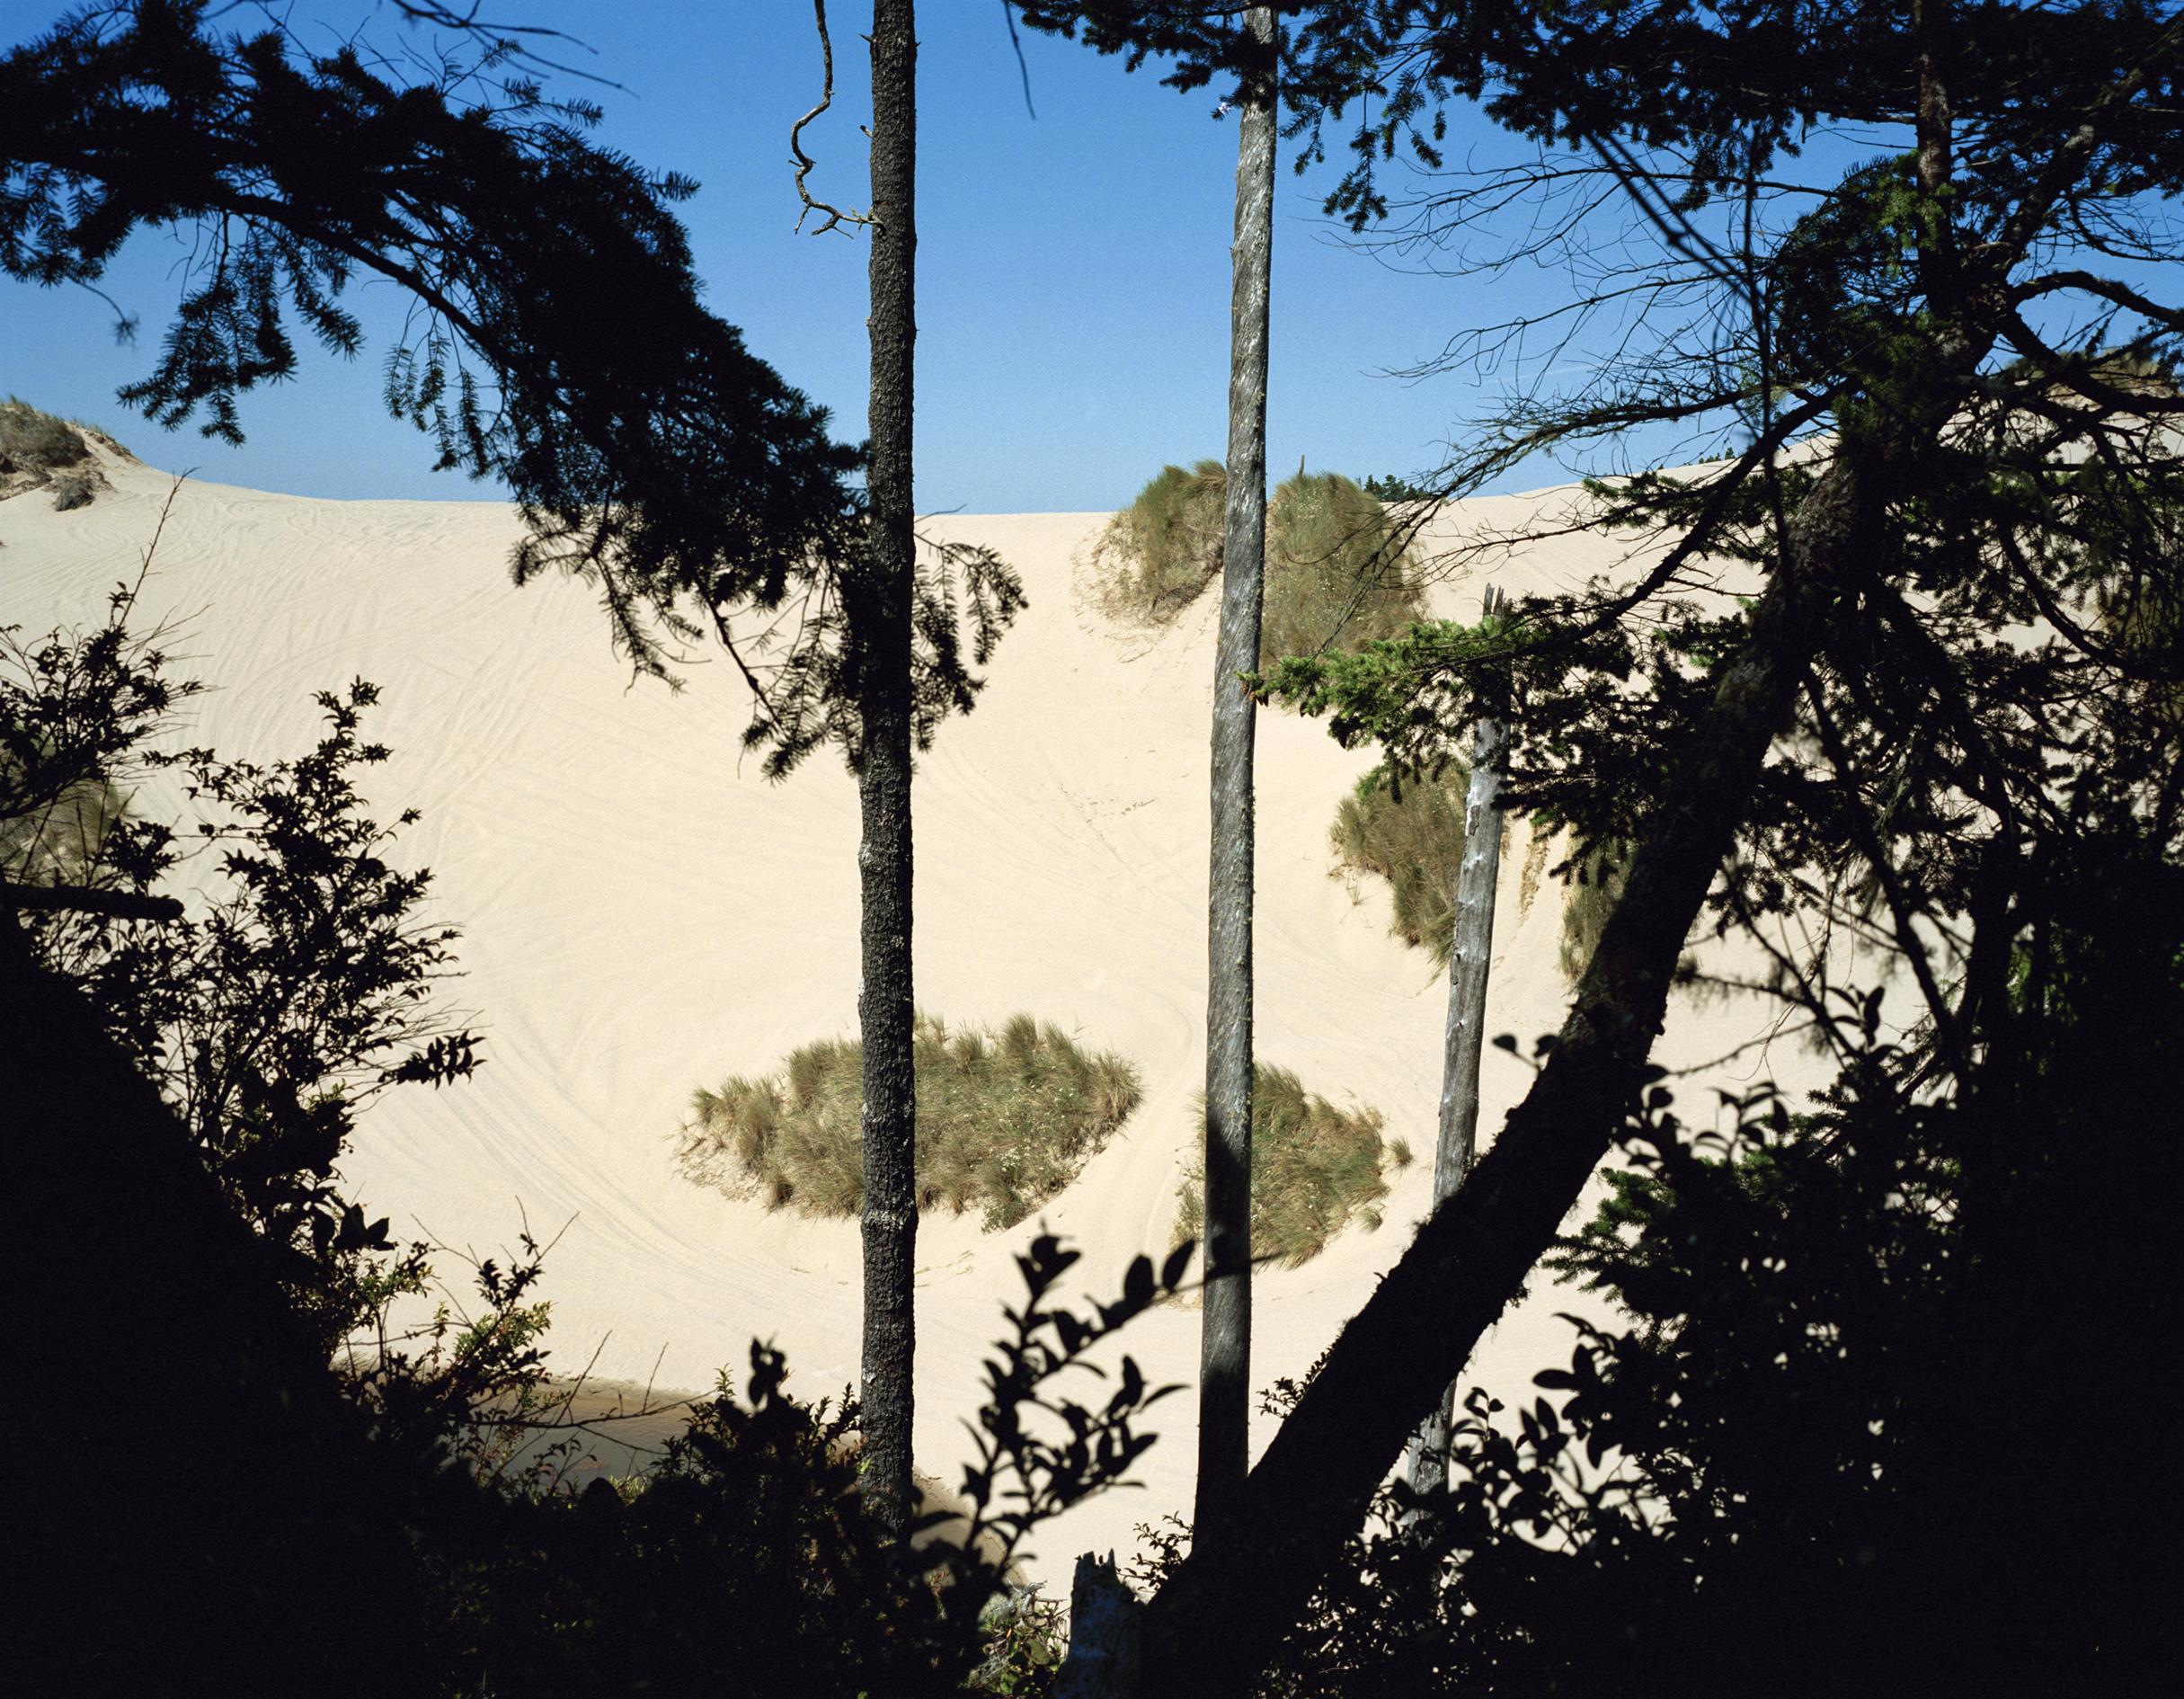 dunes_11x14.jpg